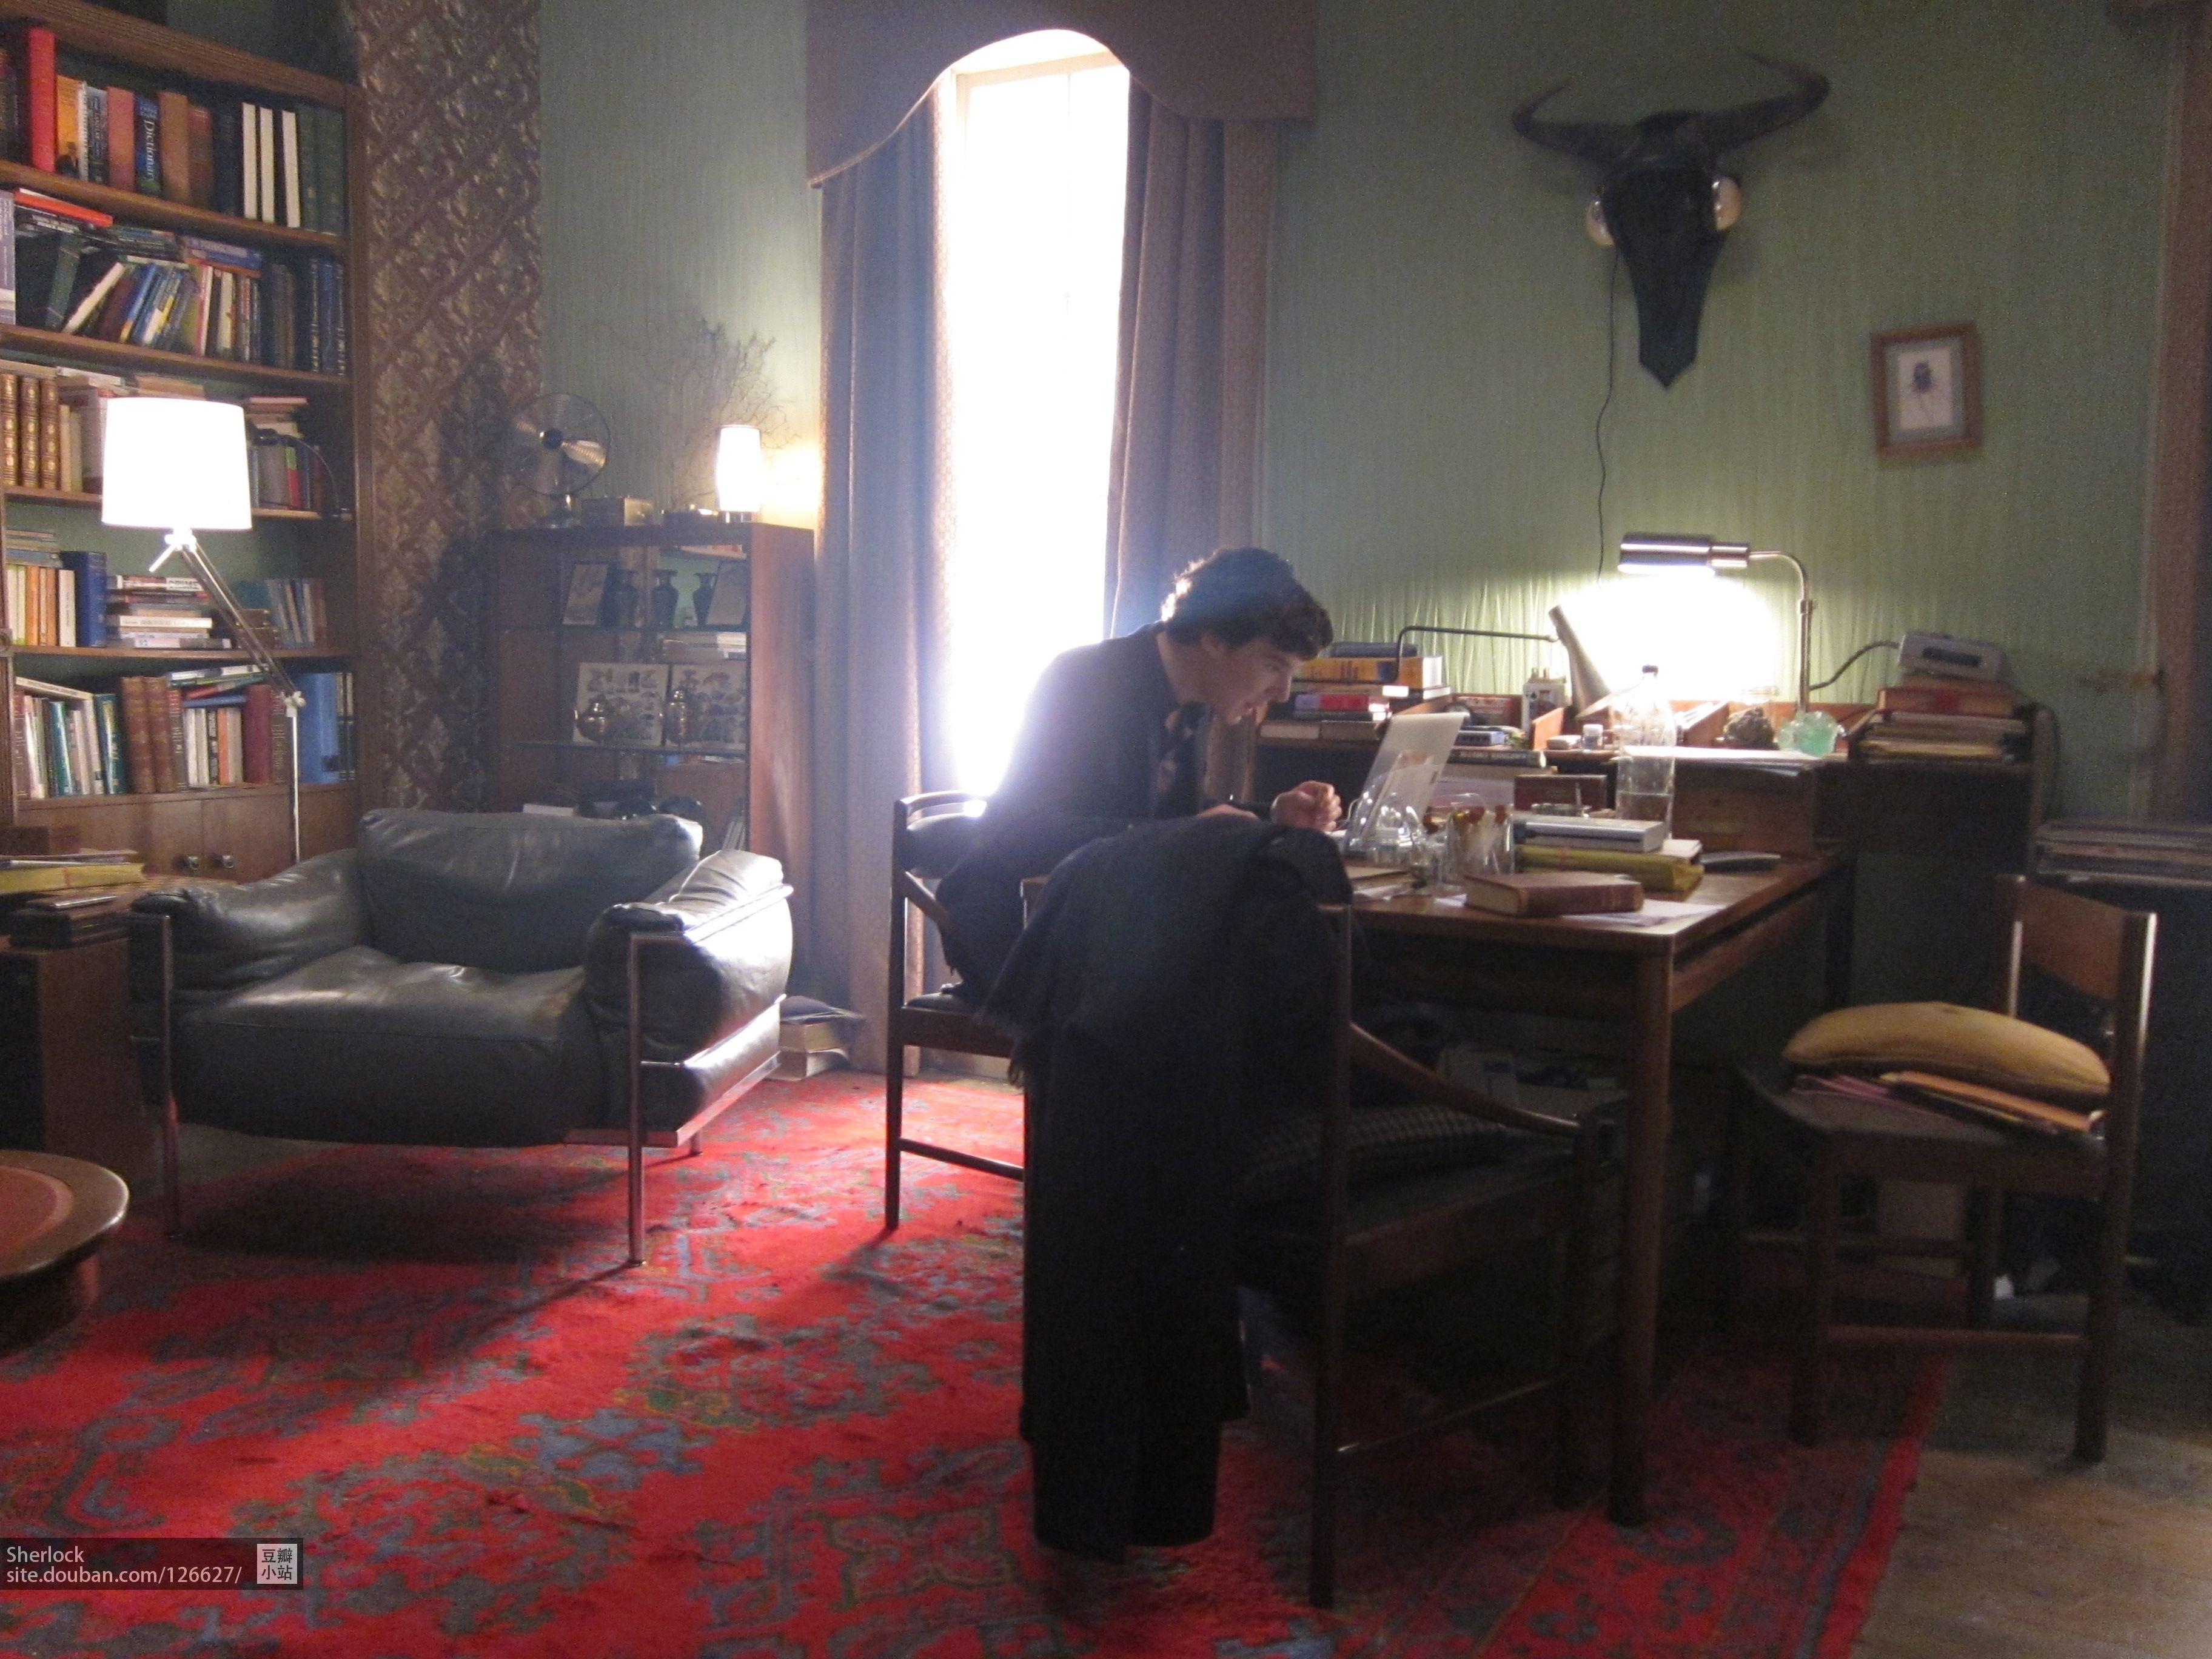 Living room victorian pinterest baker street sofas and 221b - Love The Red Turkish Ushak Area Rug Inside The 221b Flat Of Bbc S Sherlock